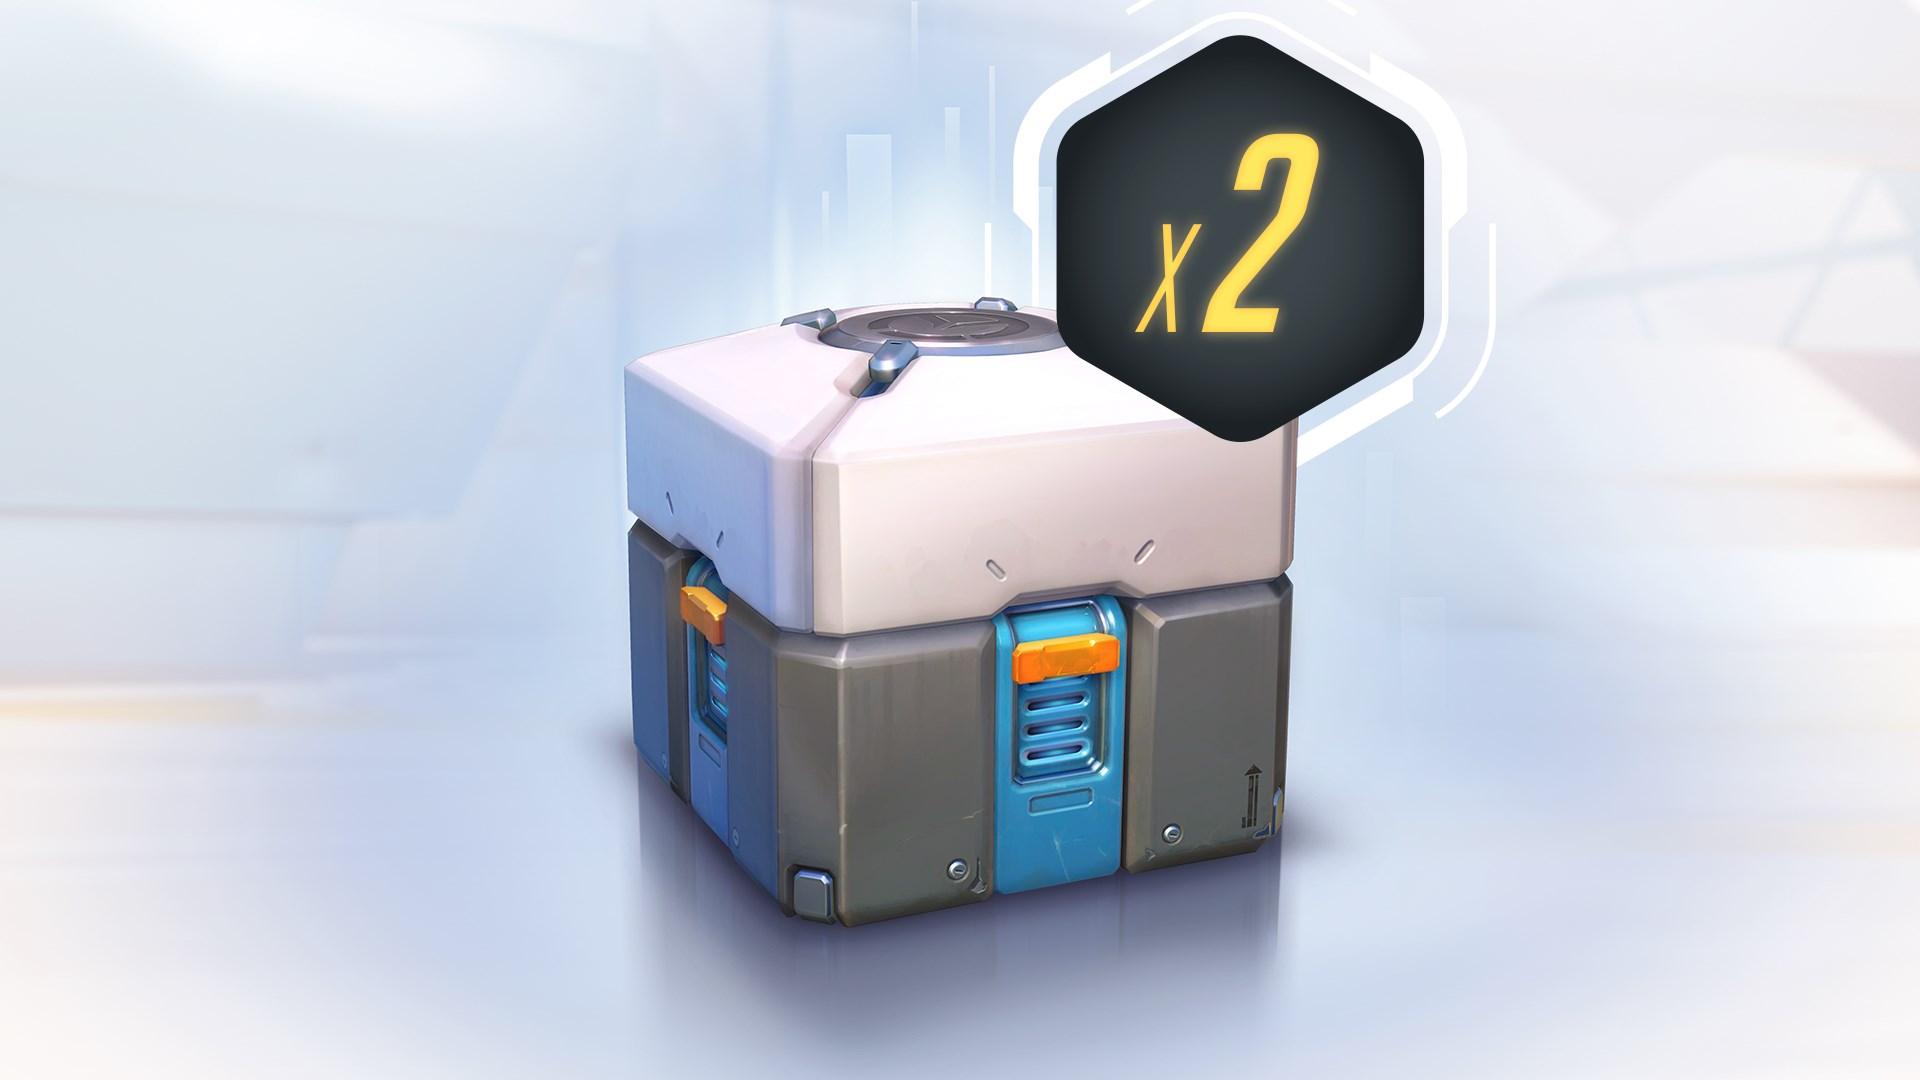 Overwatch - 2 Caixas de itens